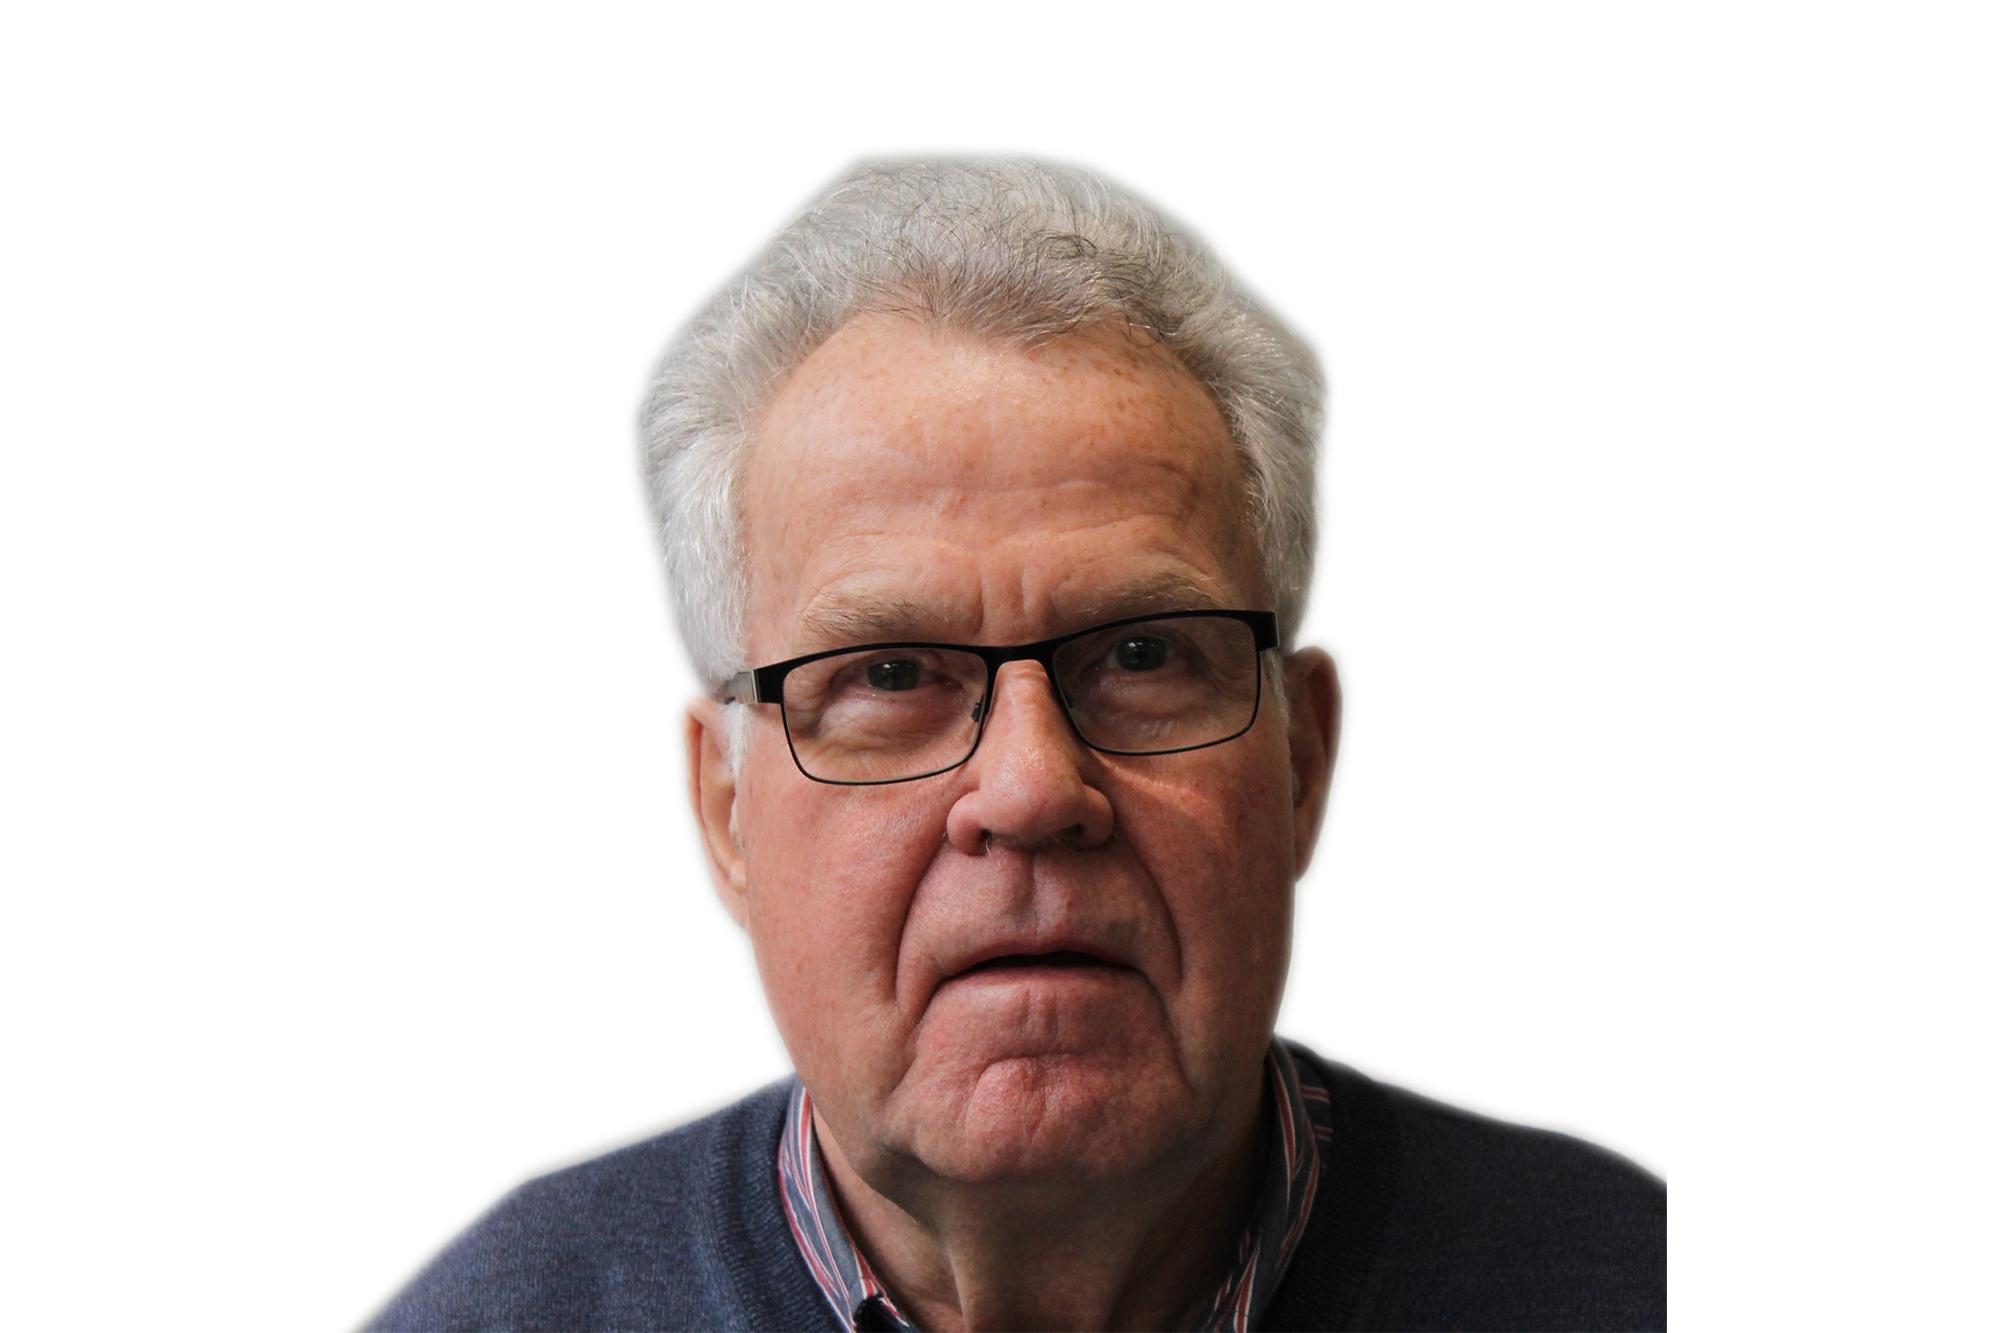 Gerrit Venderbosch